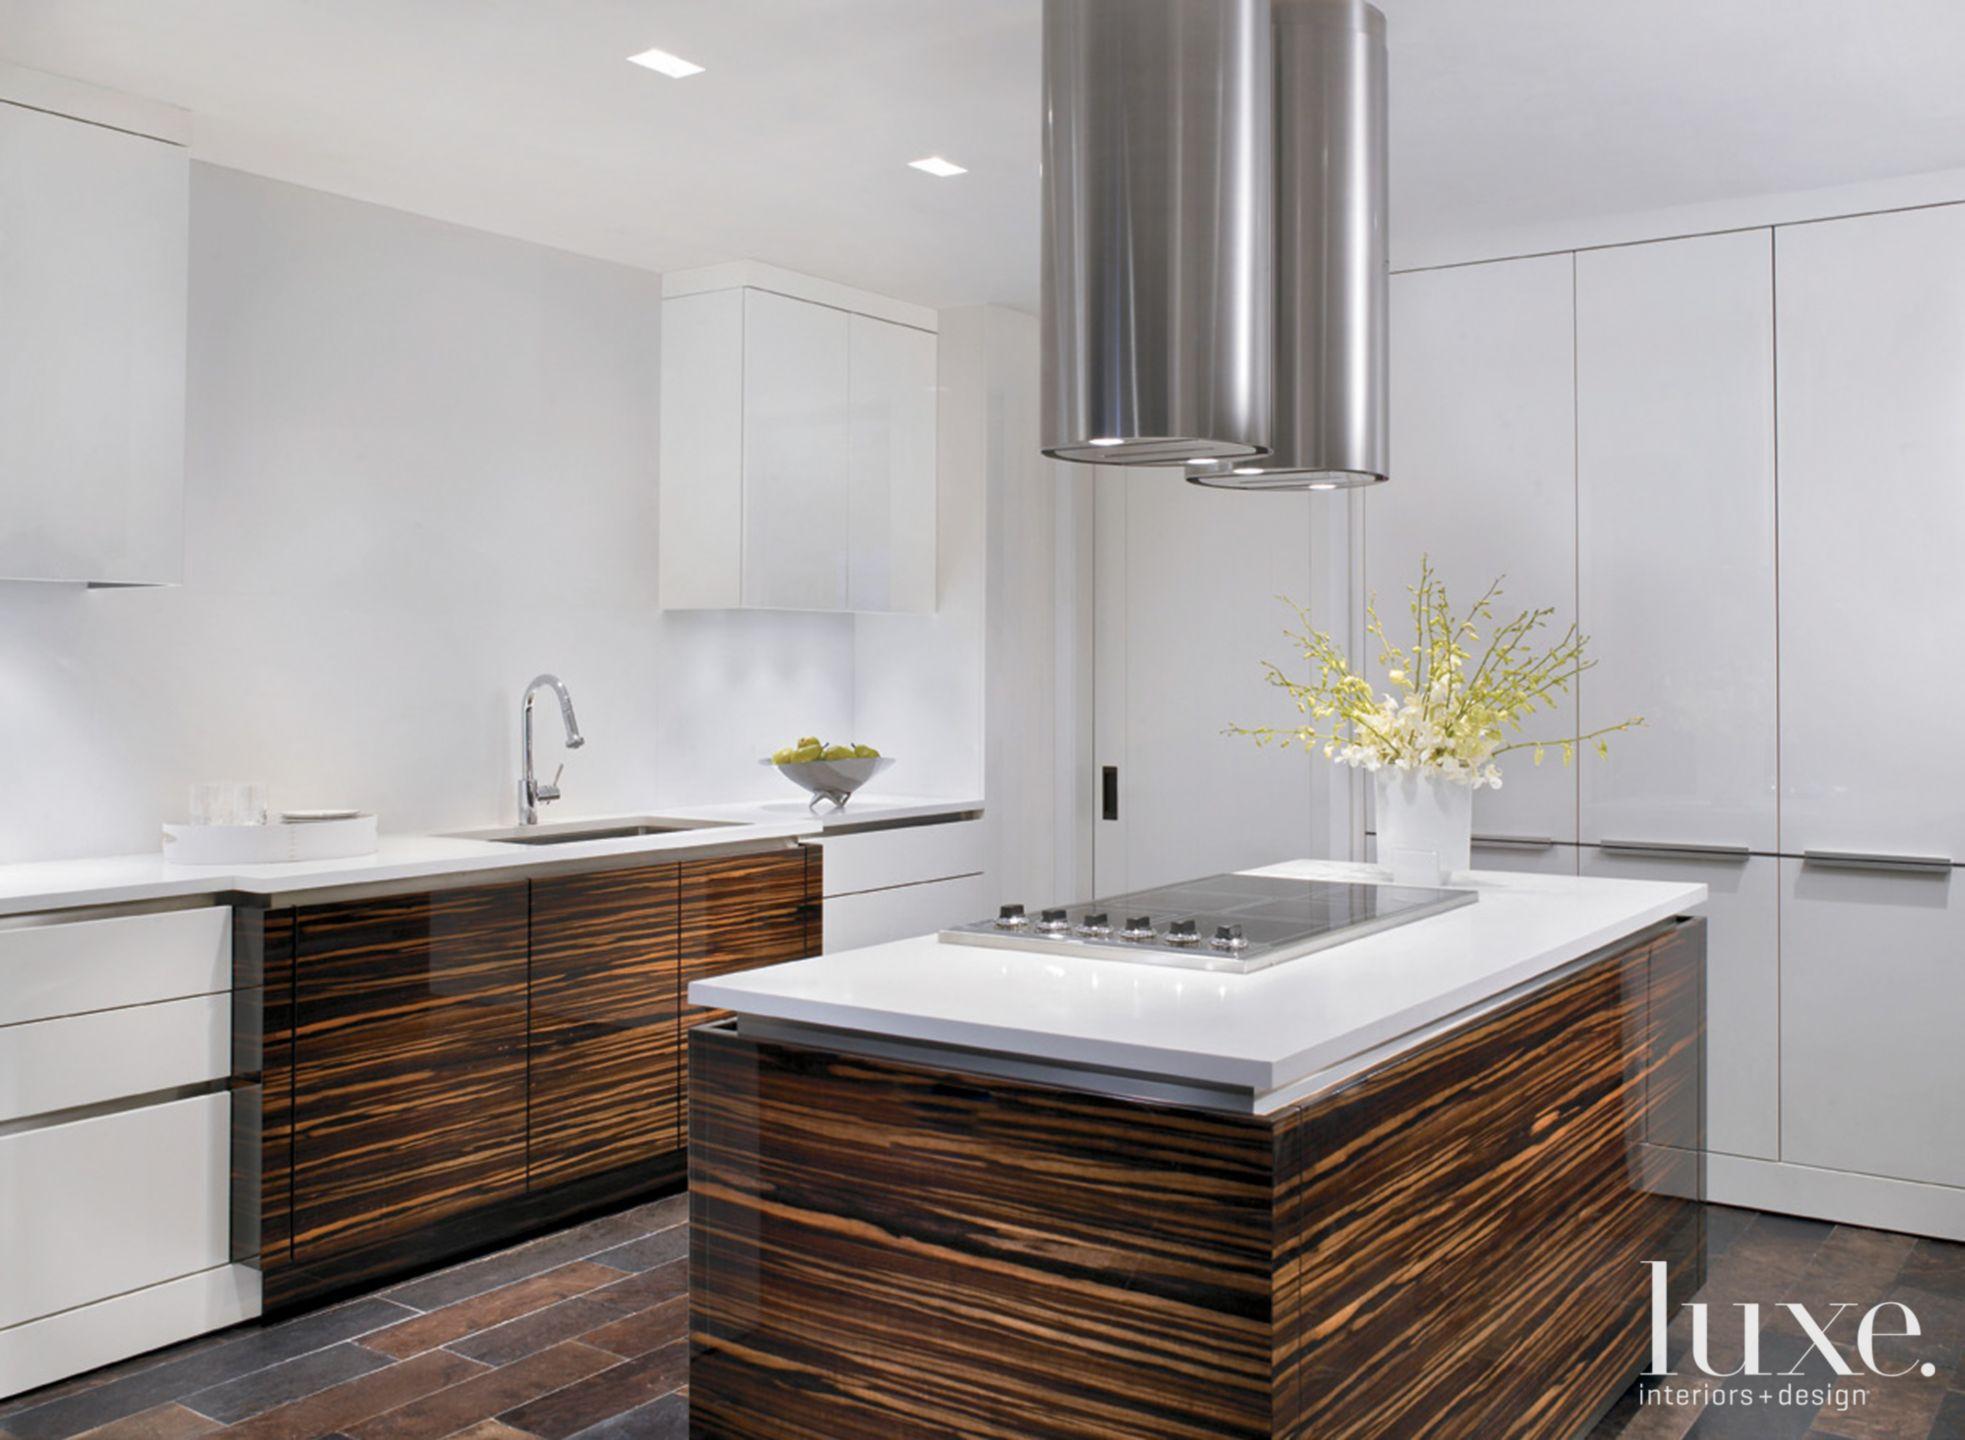 A Waterfront Miami Condominium With Retro Classics Luxe Interiors Design